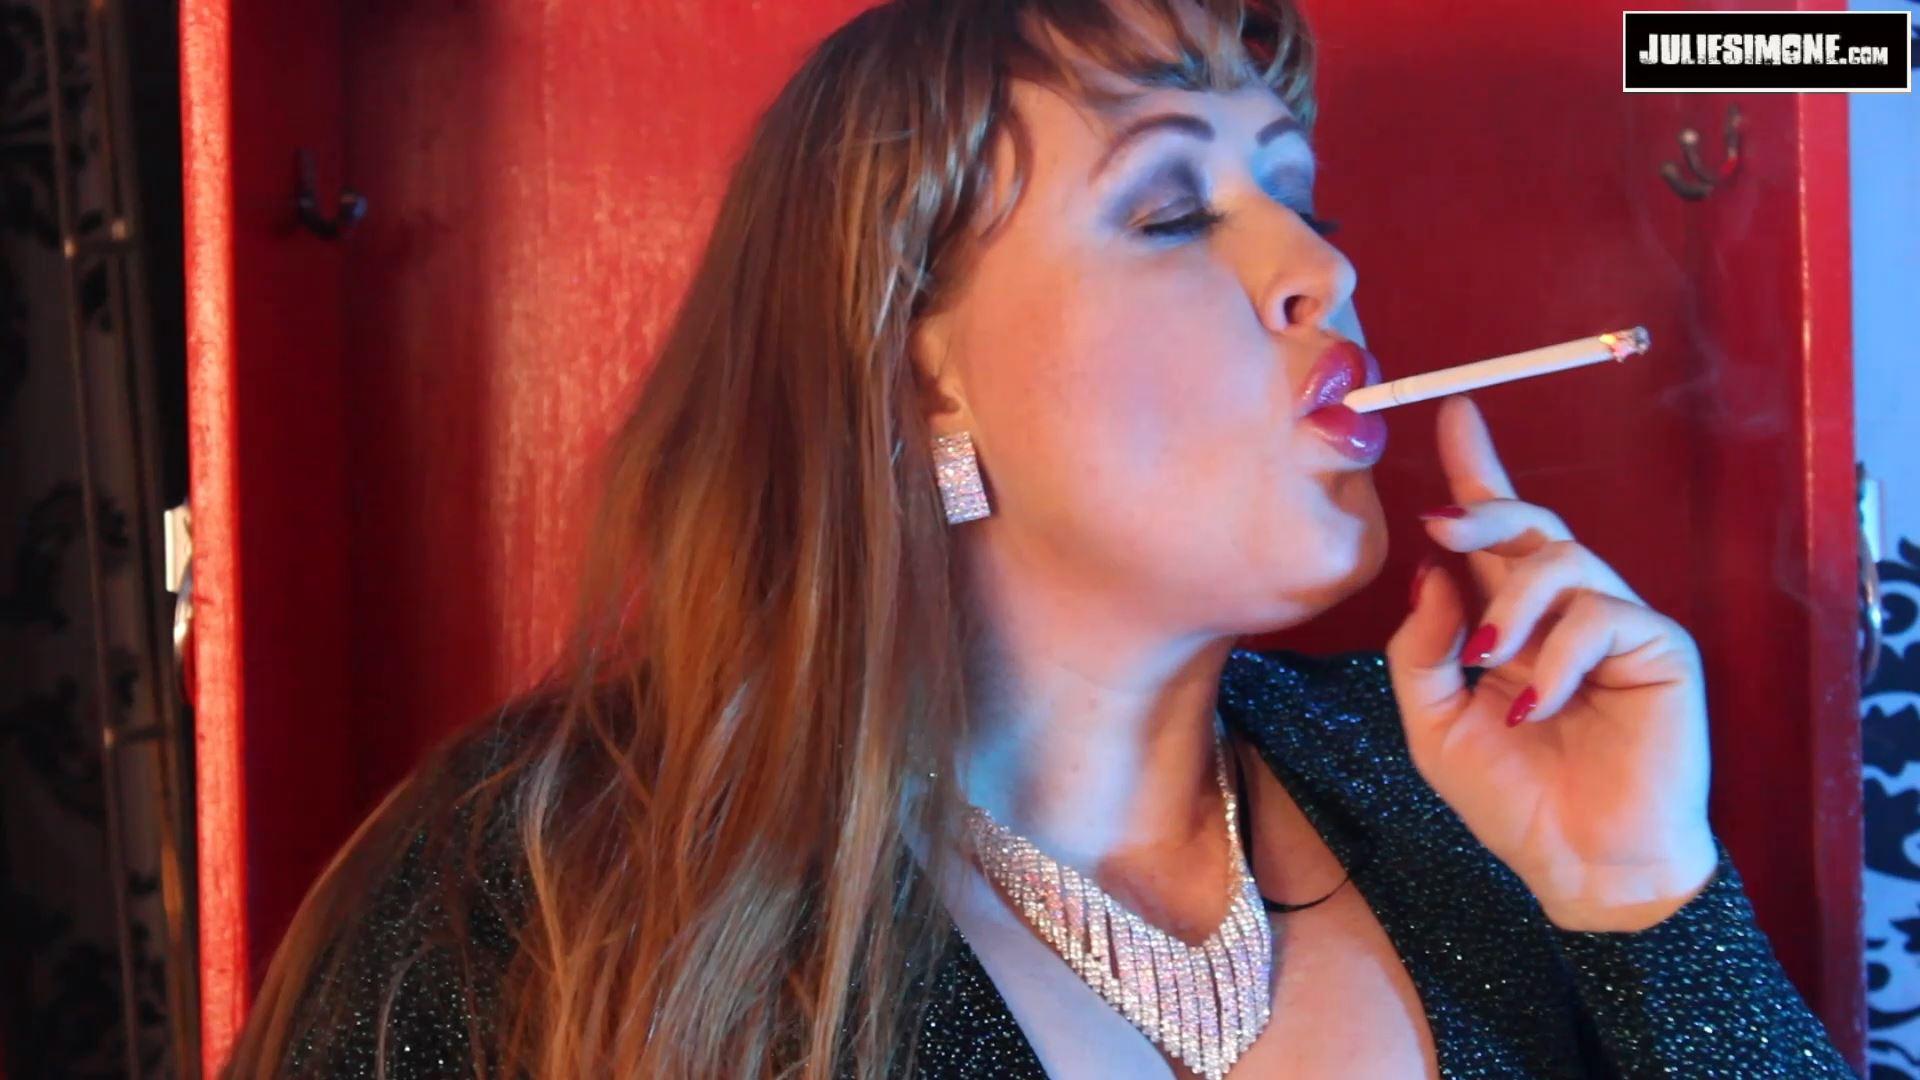 Julie Simone In Scene: Smoking Sparkly Gown - JULIESIMONE - FULL HD/1080p/MP4